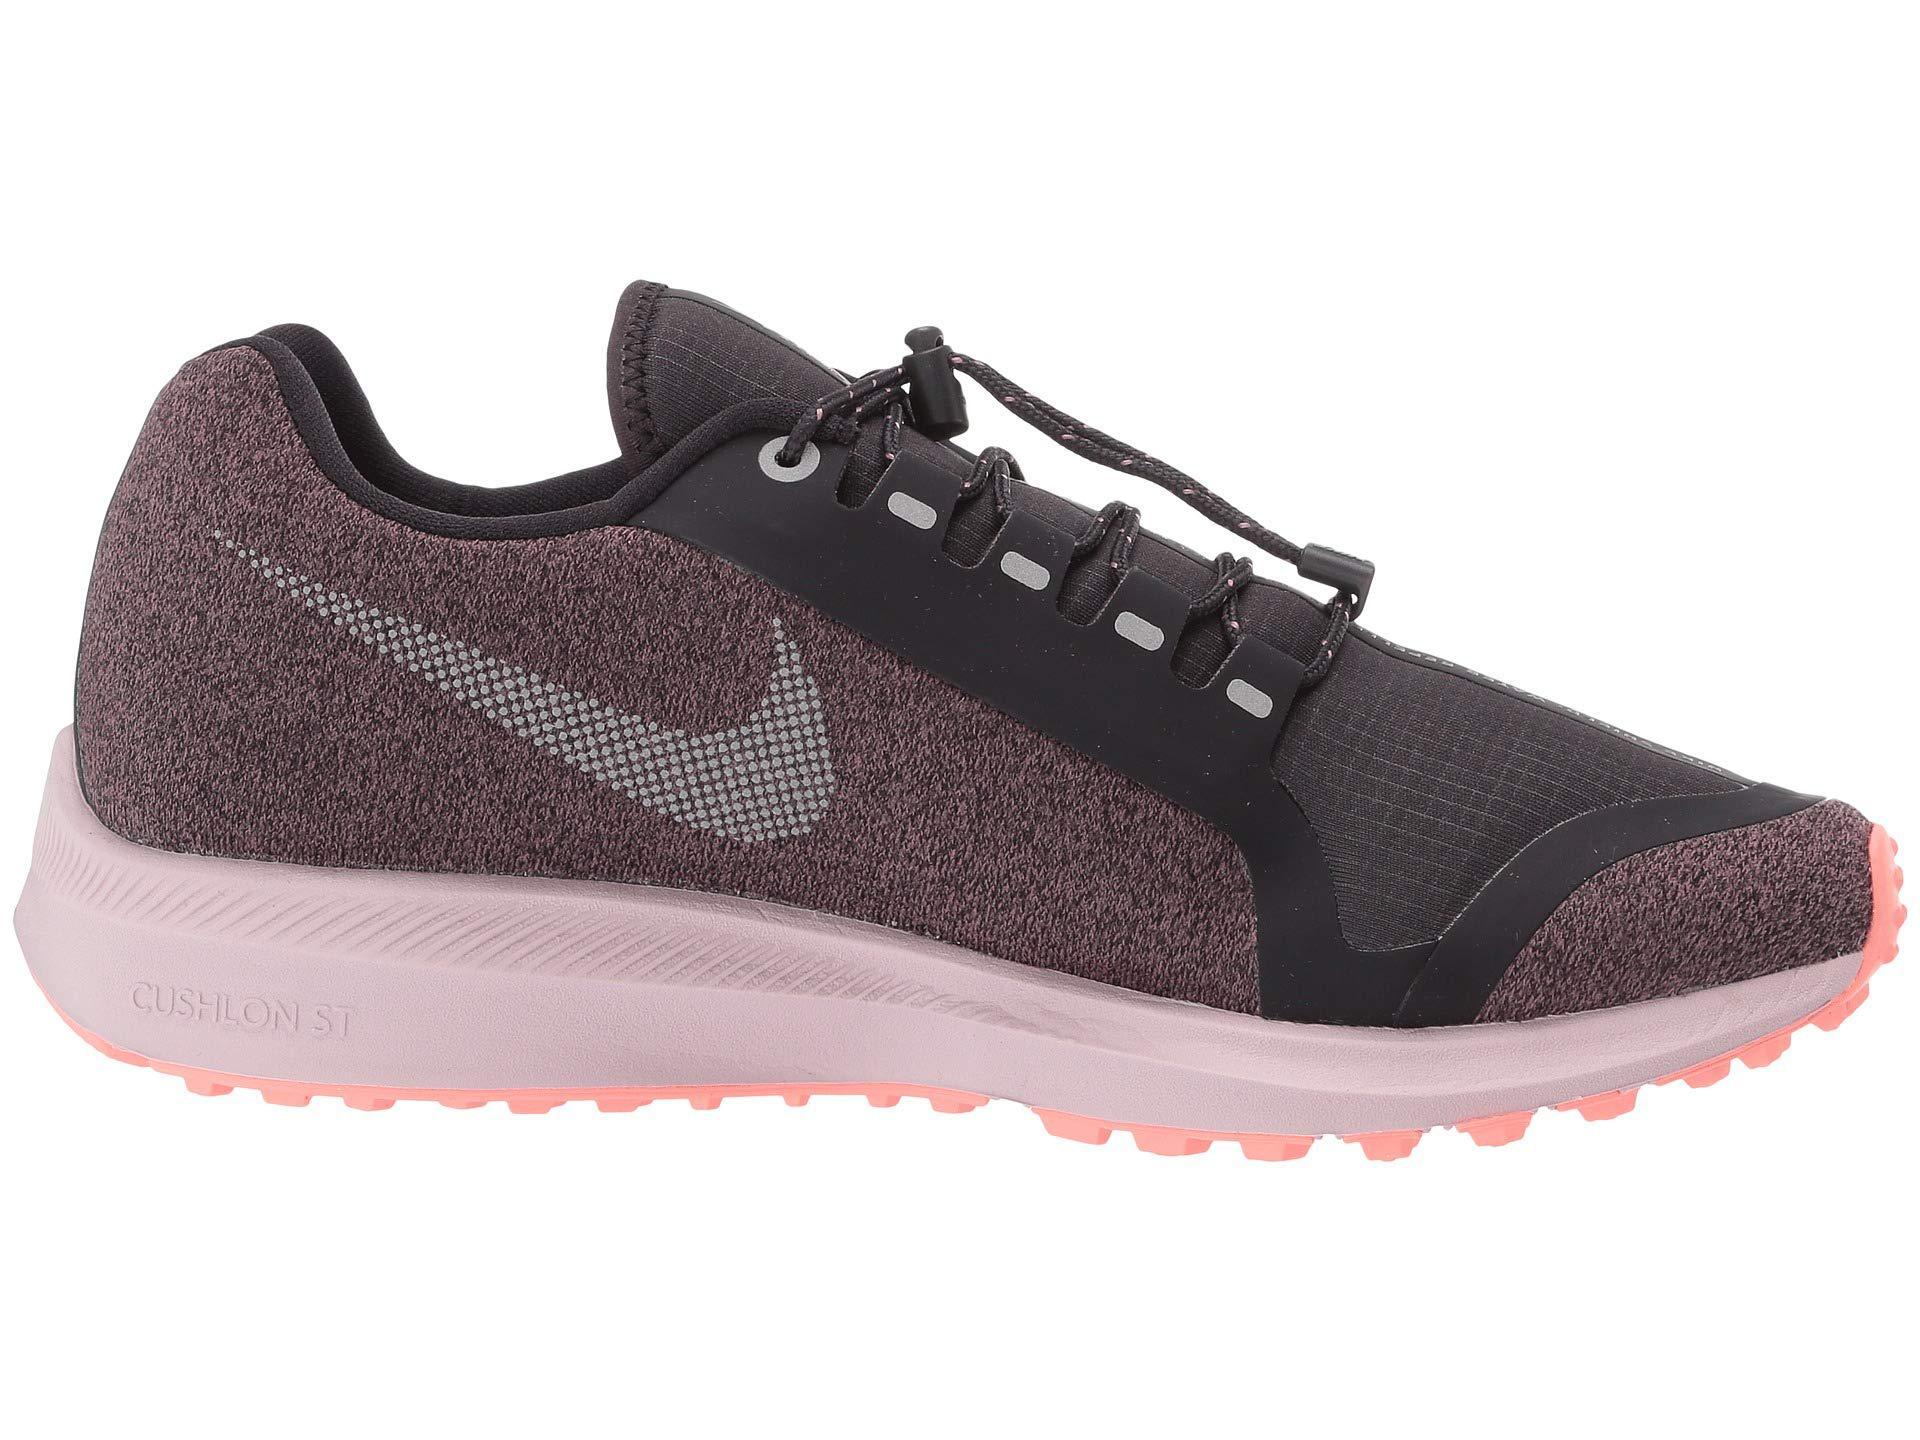 d32a3c144357 Lyst - Nike Air Zoom Winflo 5 Run Shield (smokey Mauve metallic Silver oil  Grey) Women s Running Shoes in Metallic